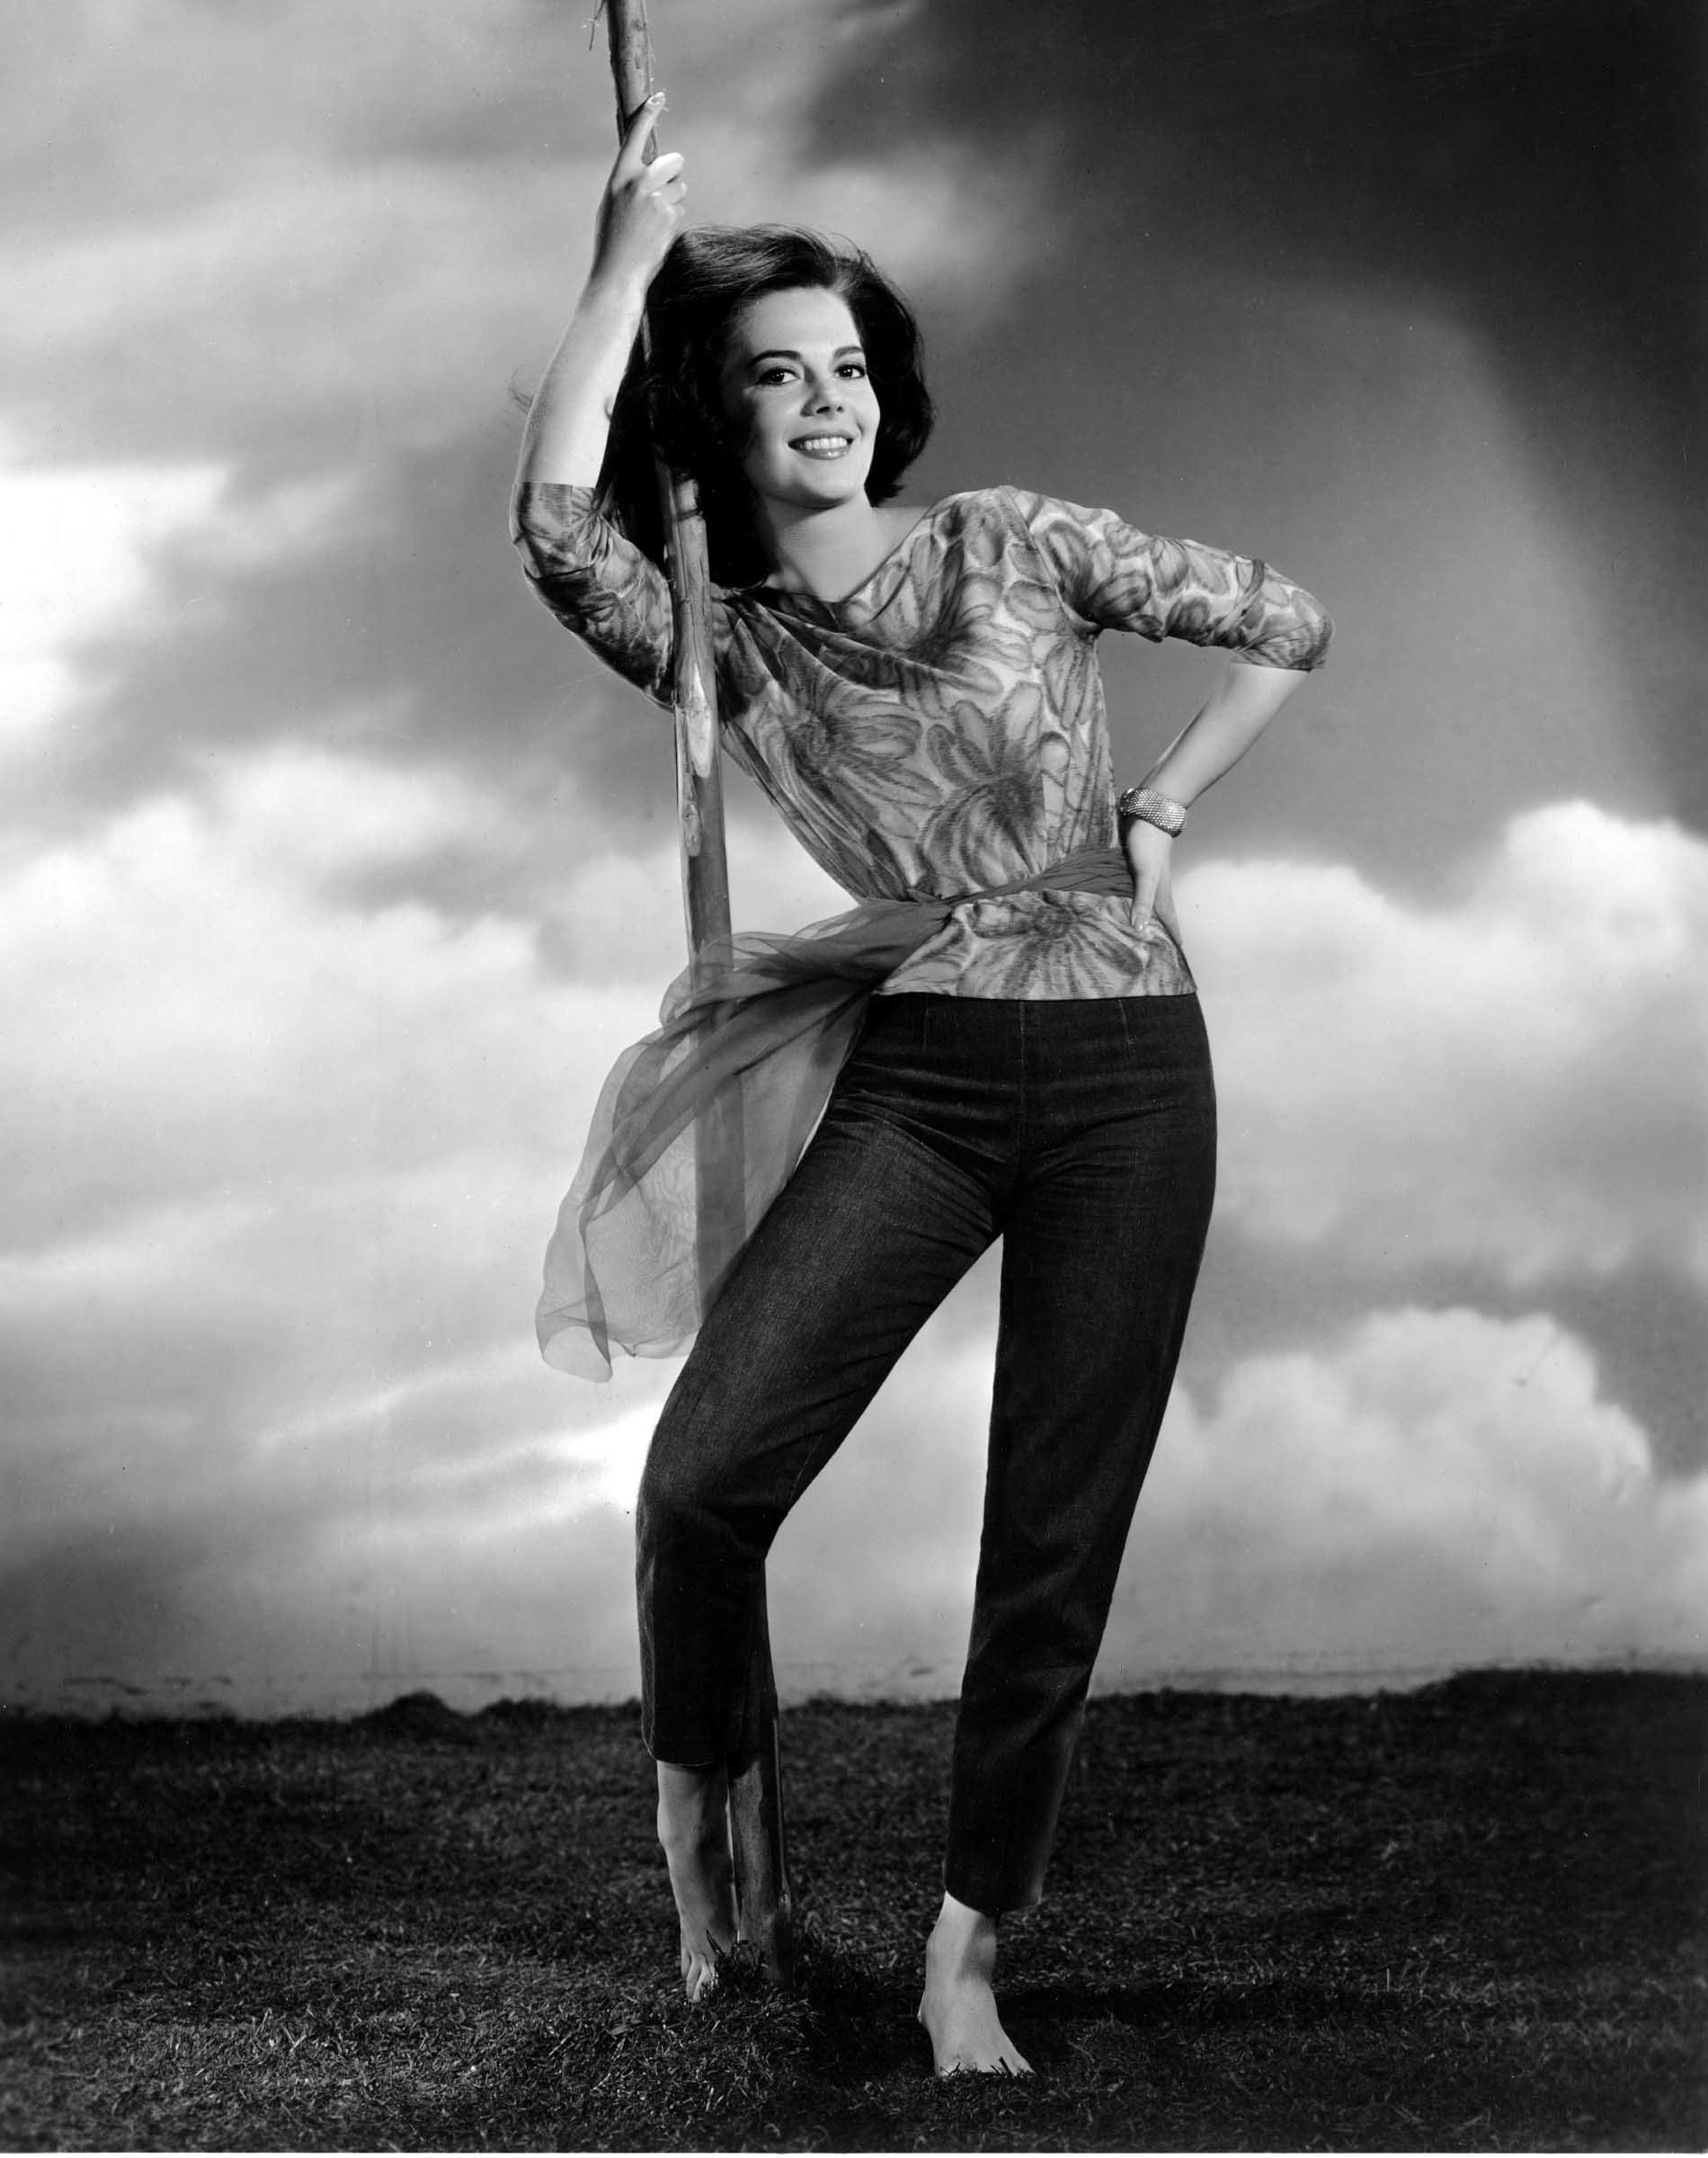 https://pics.wikifeet.com/Natalie-Wood-Feet-939891.jpg